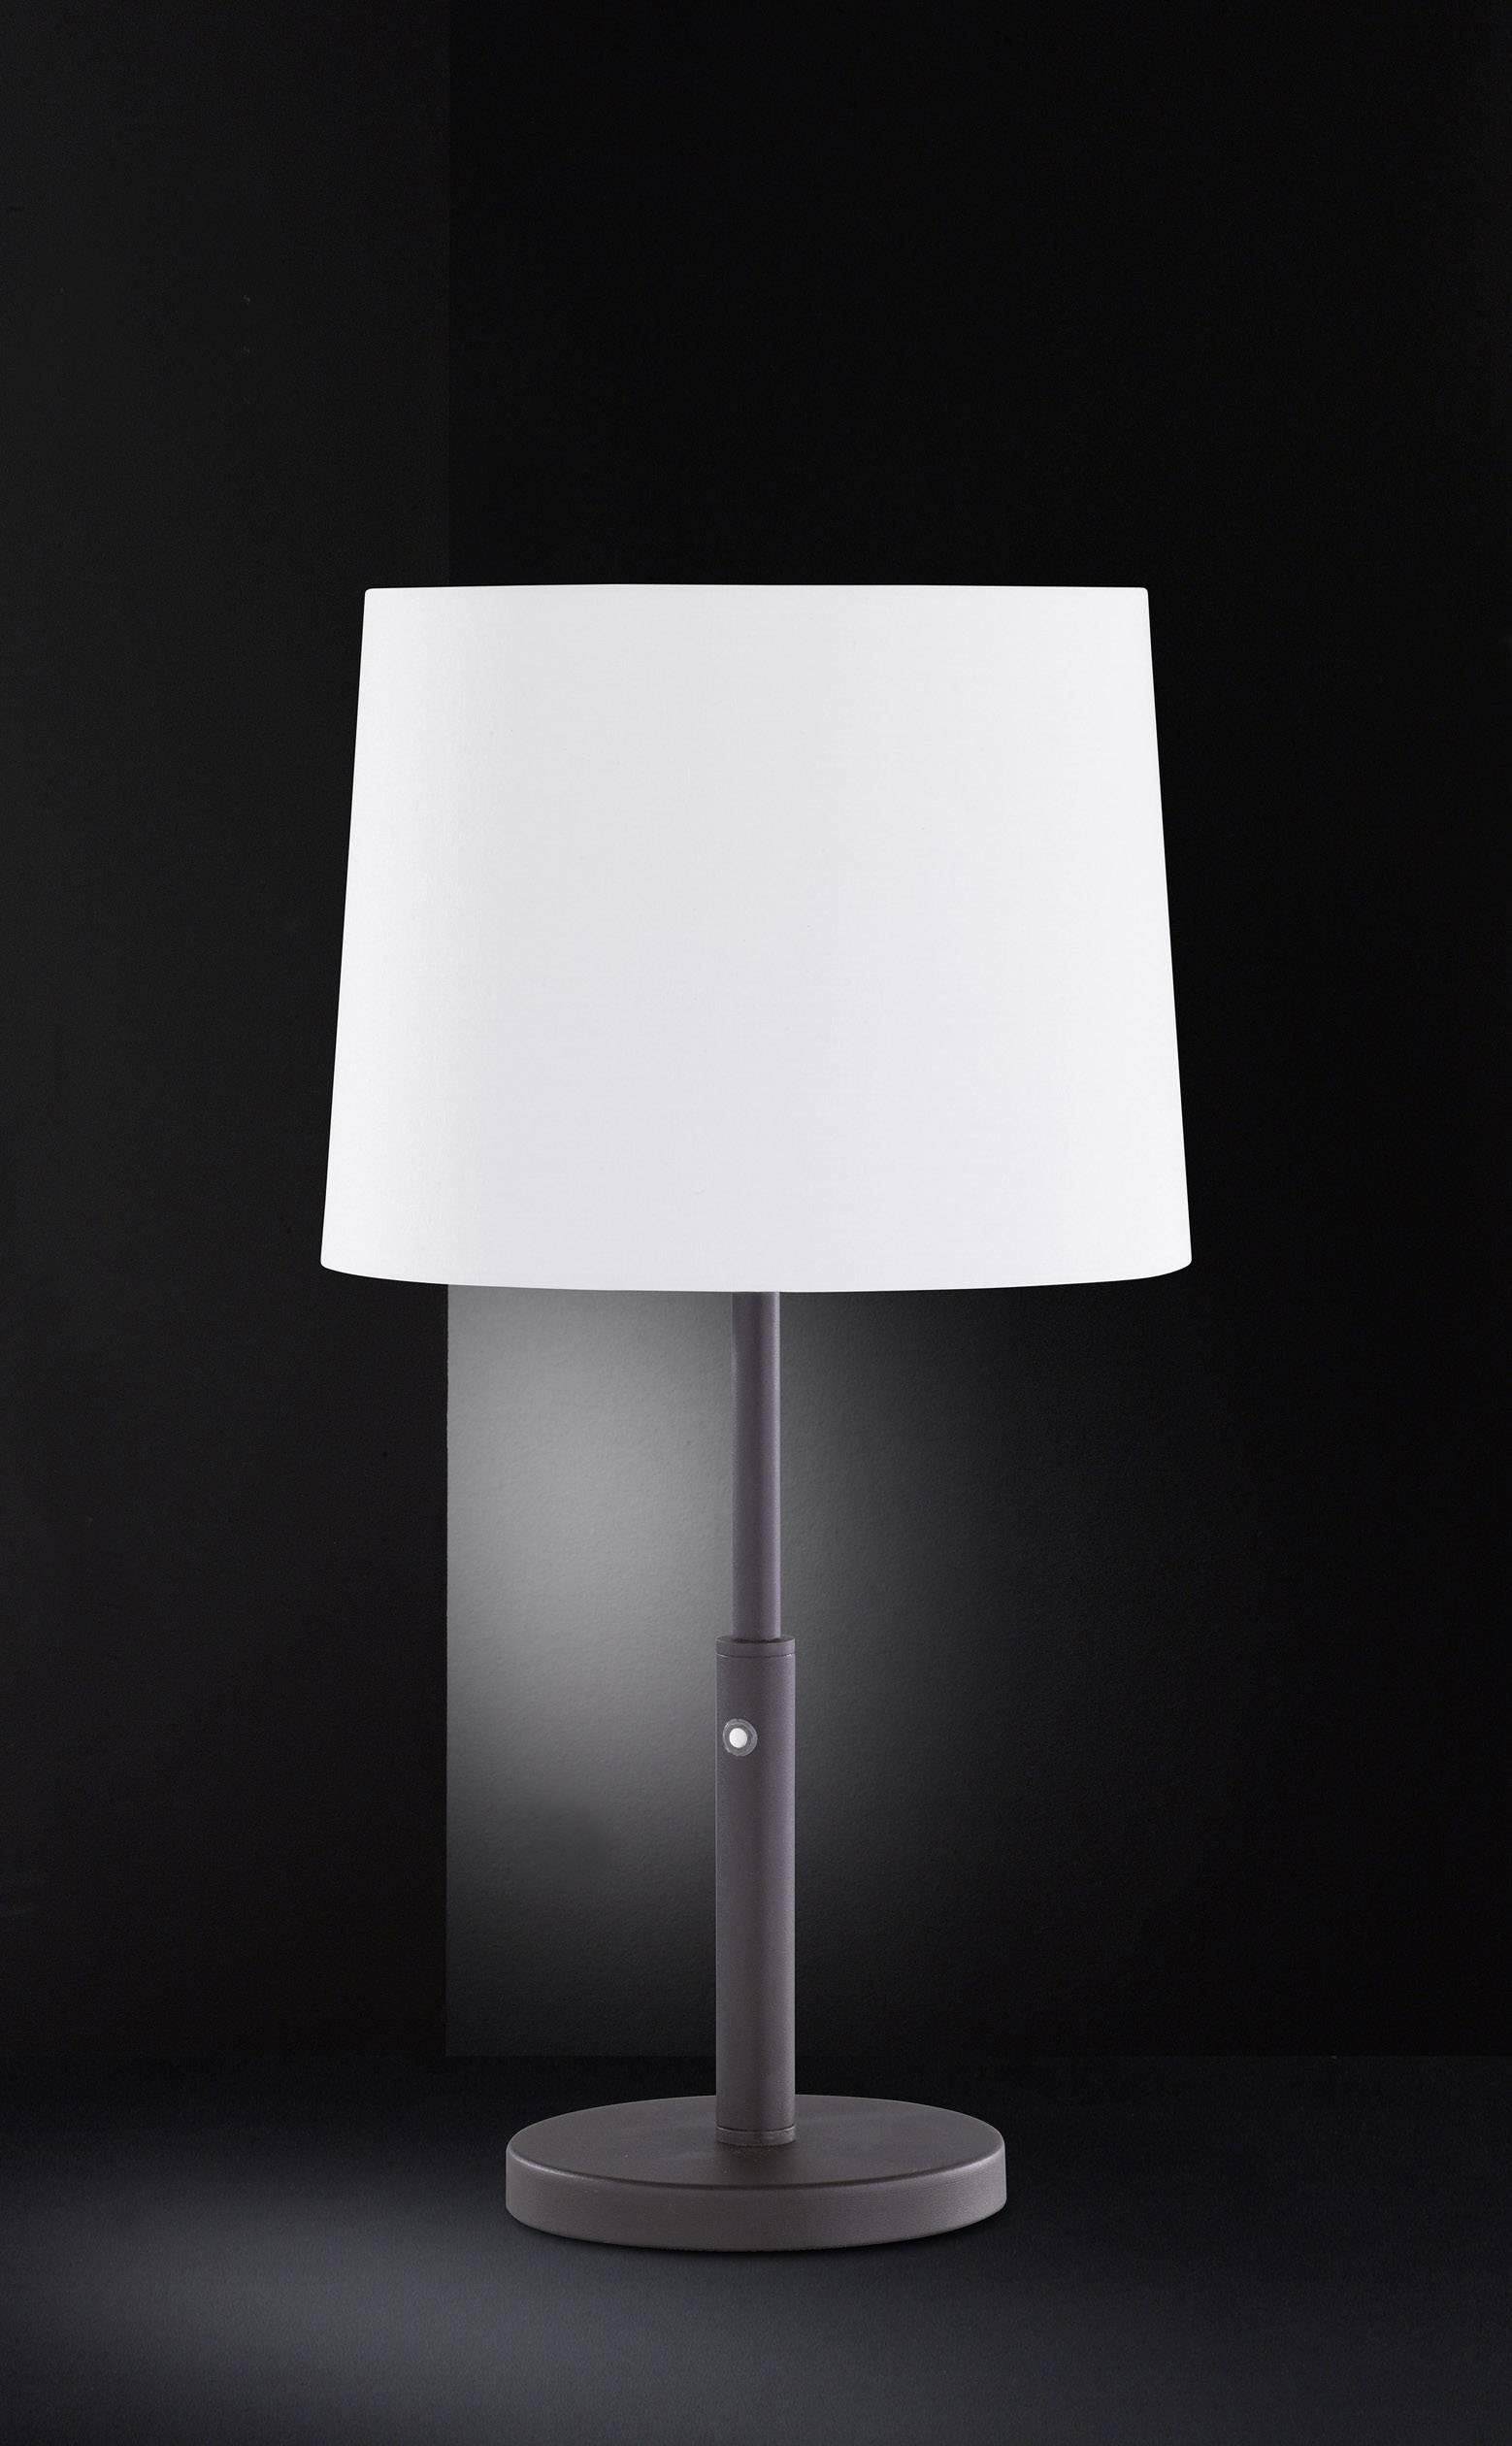 ACTION Hilver 830503036000 LED bordsbelysning 12 W Varmvit Brons, Vit